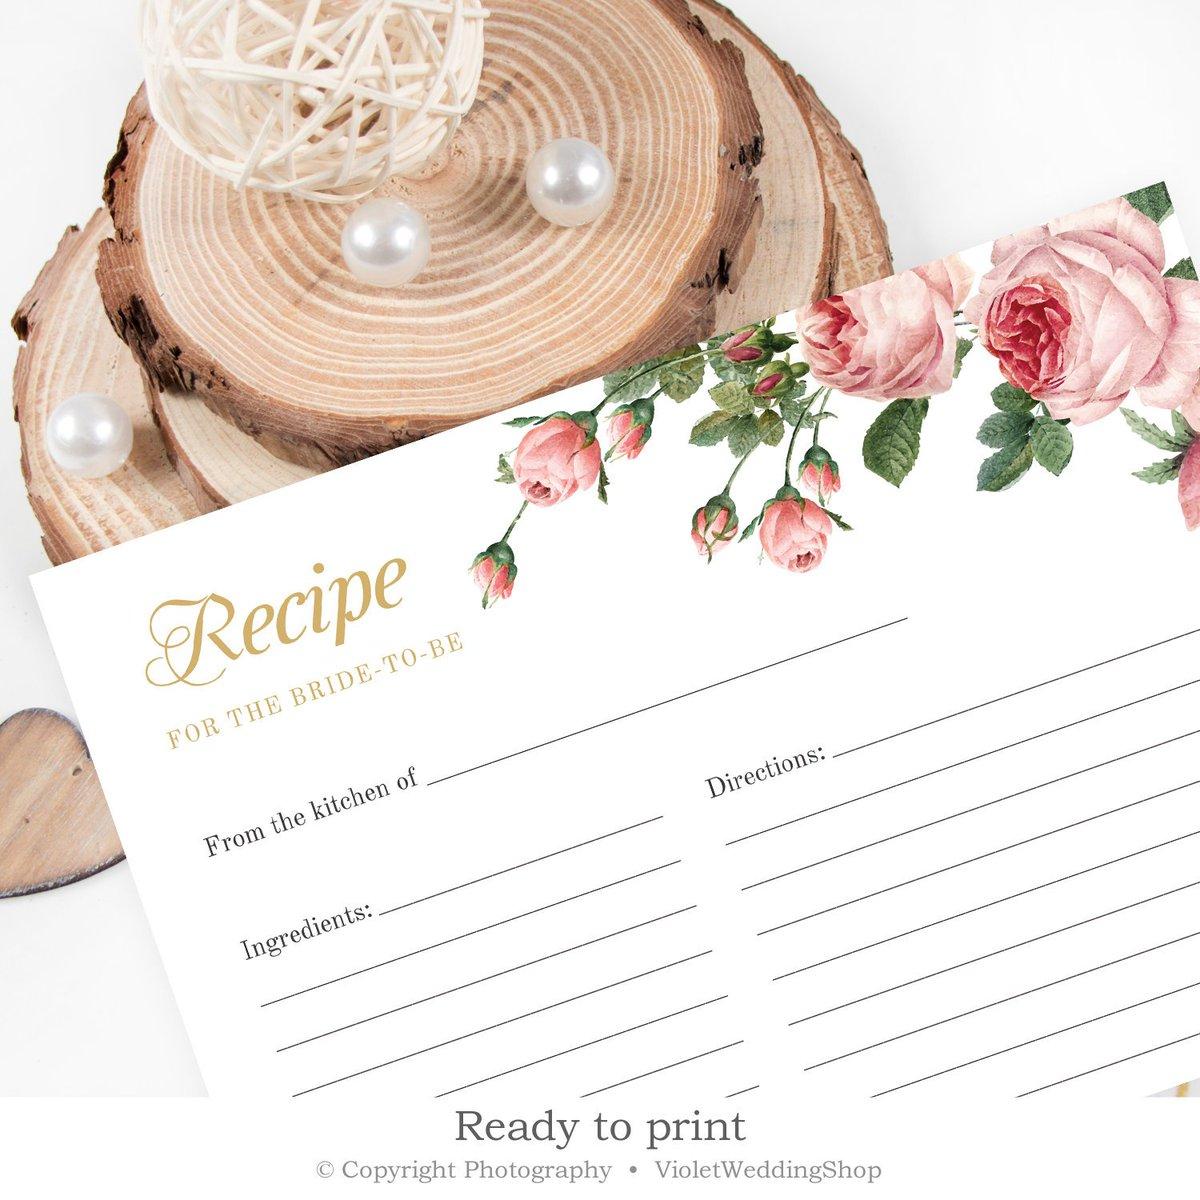 Recipe Card Pink Flowers Vintage Floral,Vintage Pink Bridal Shower Invitations Rustic Flowers